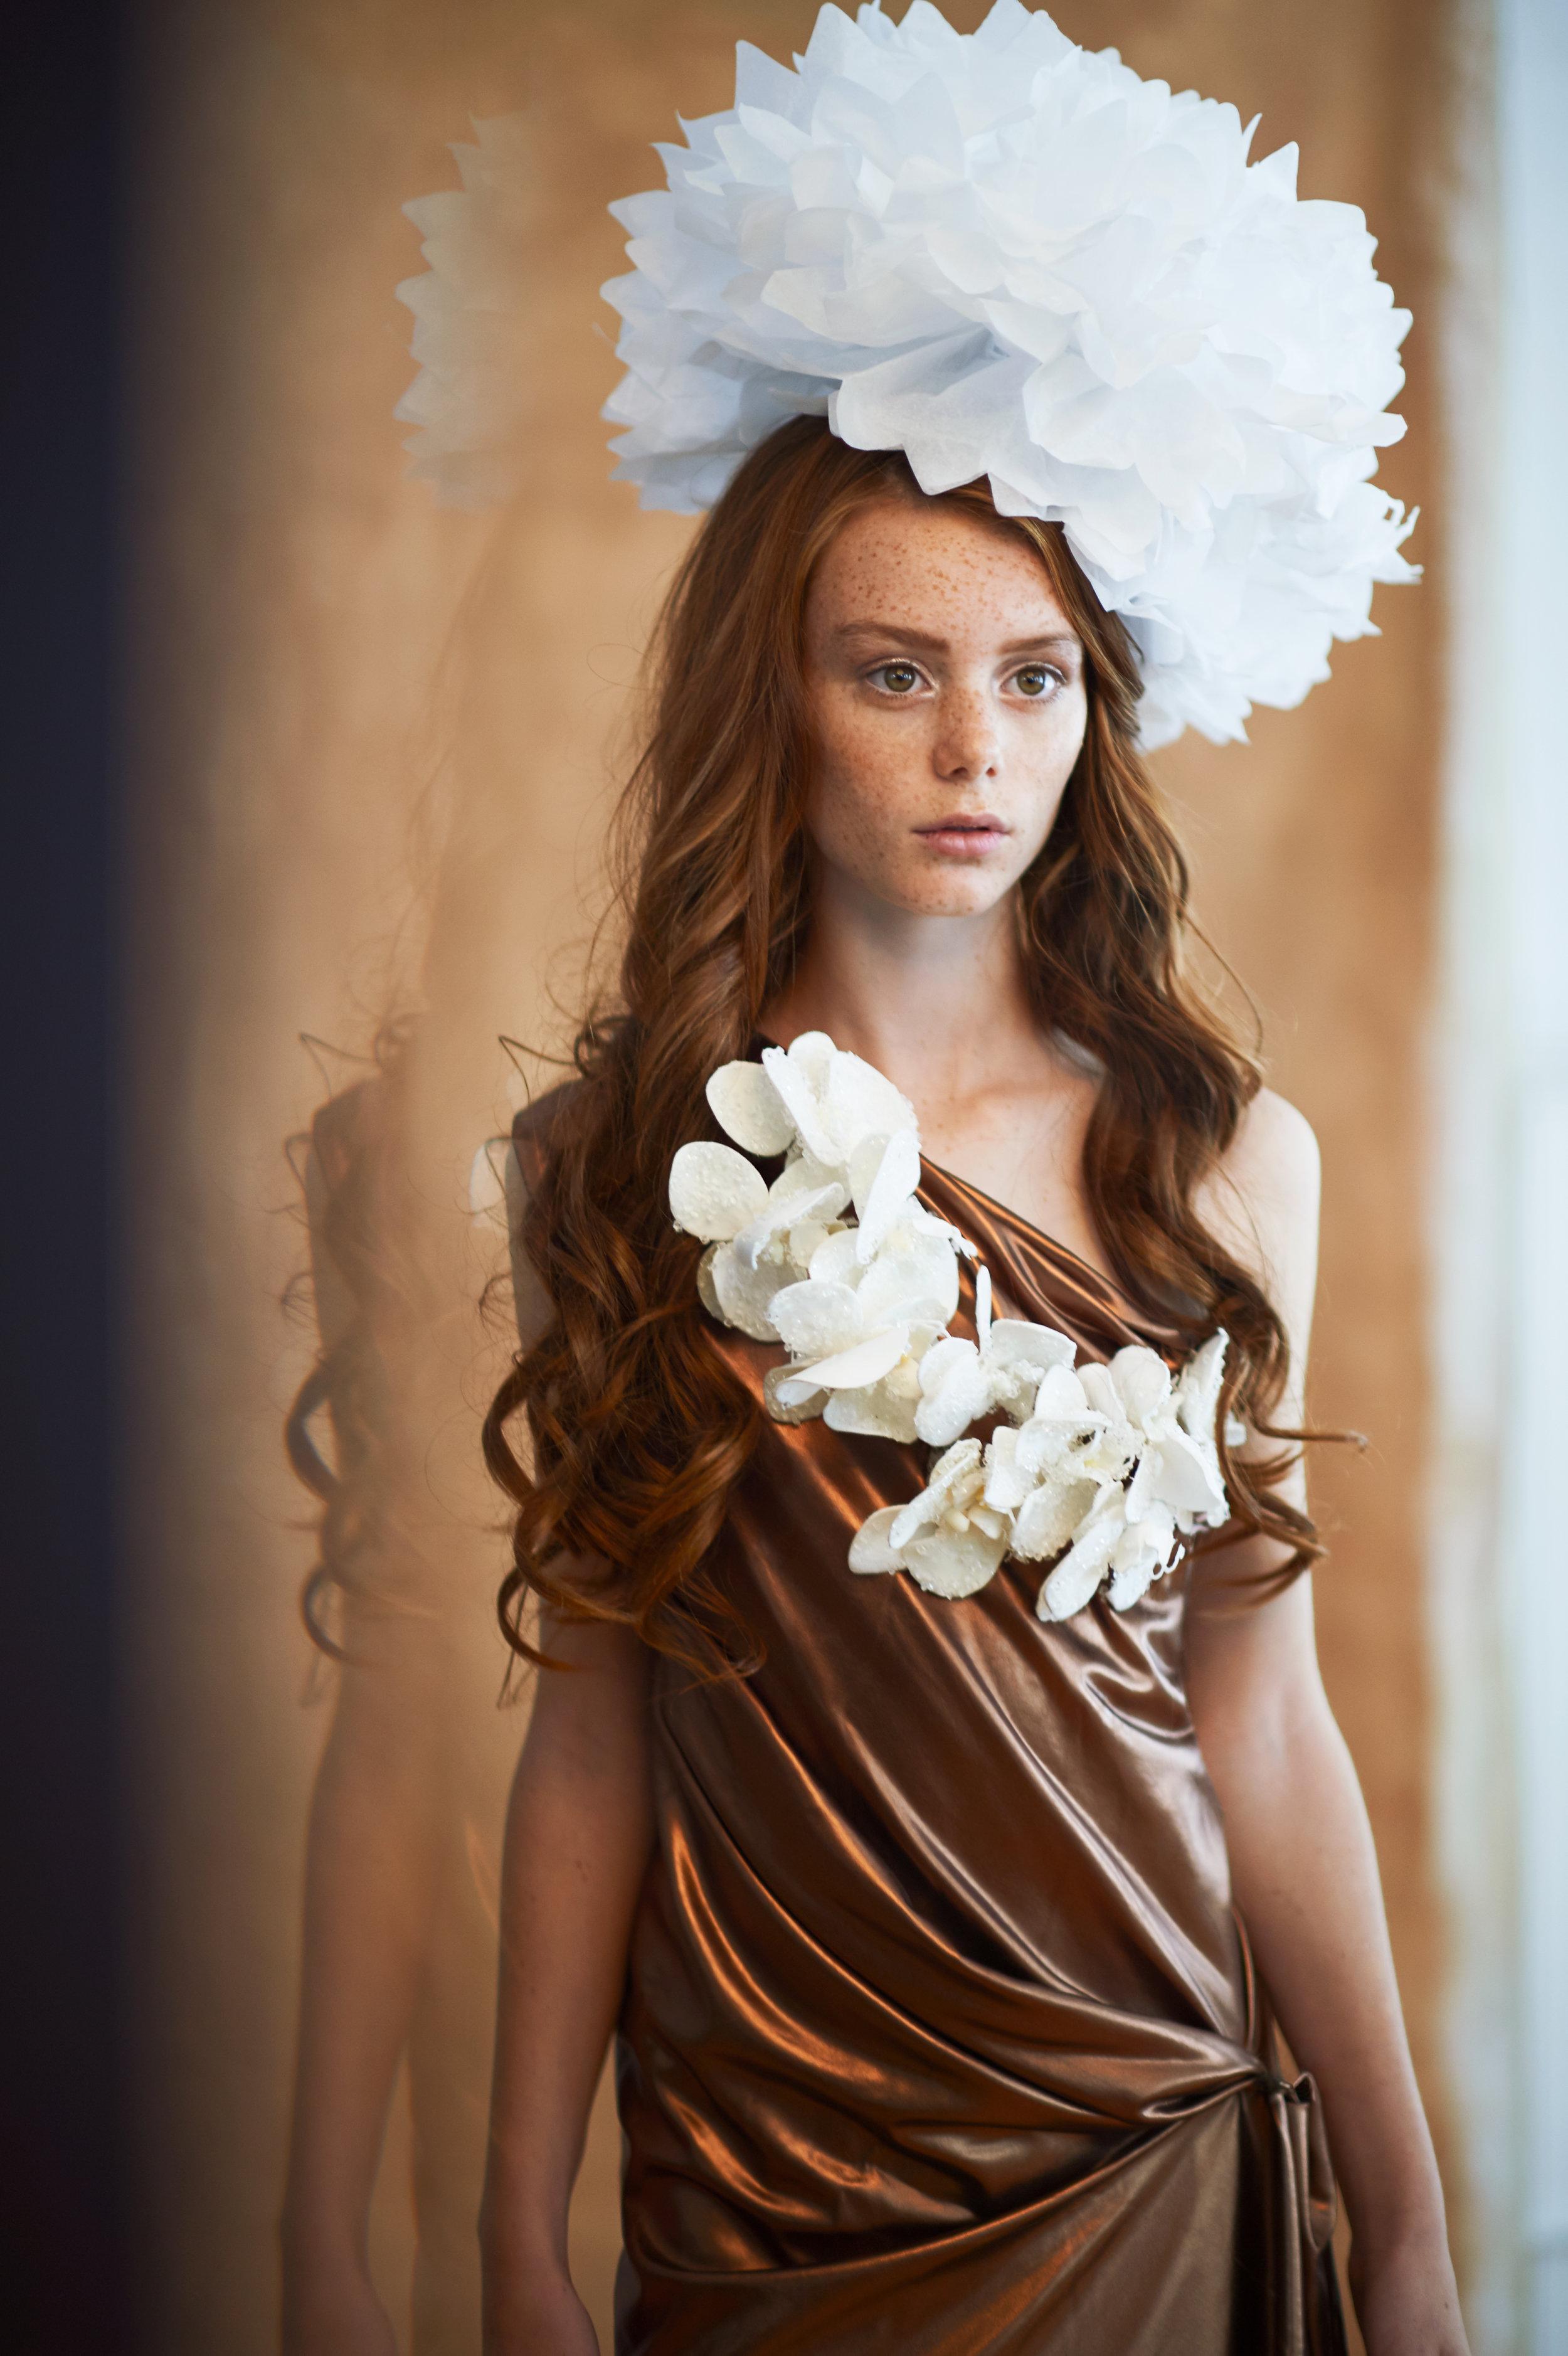 Marta-hewson-Emeryss-Teen-Portrait-Fashion-shoot- copper dress- white ornament and flower necklace.jpg